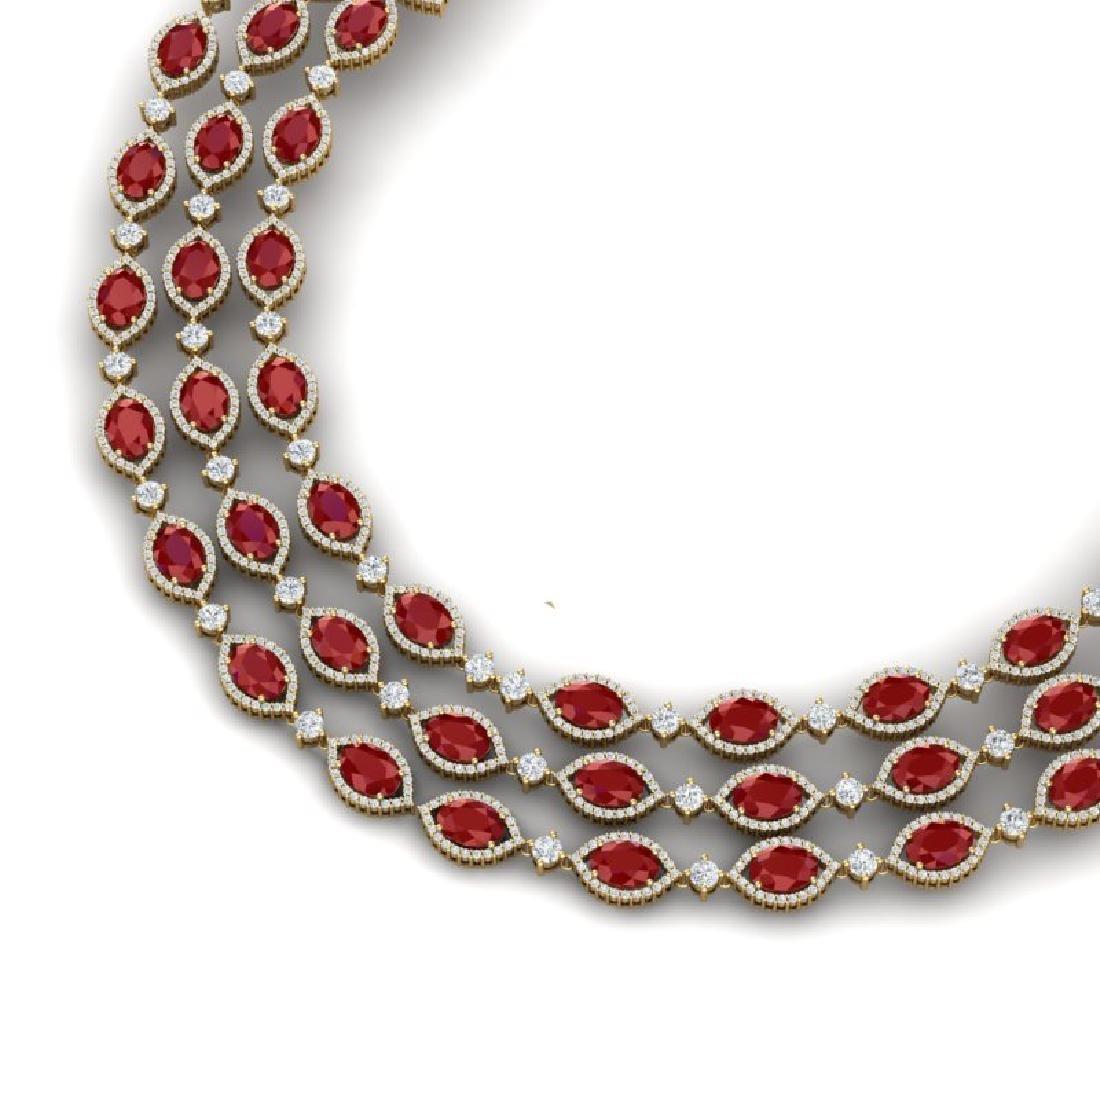 85.81 CTW Royalty Ruby & VS Diamond Necklace 18K Yellow